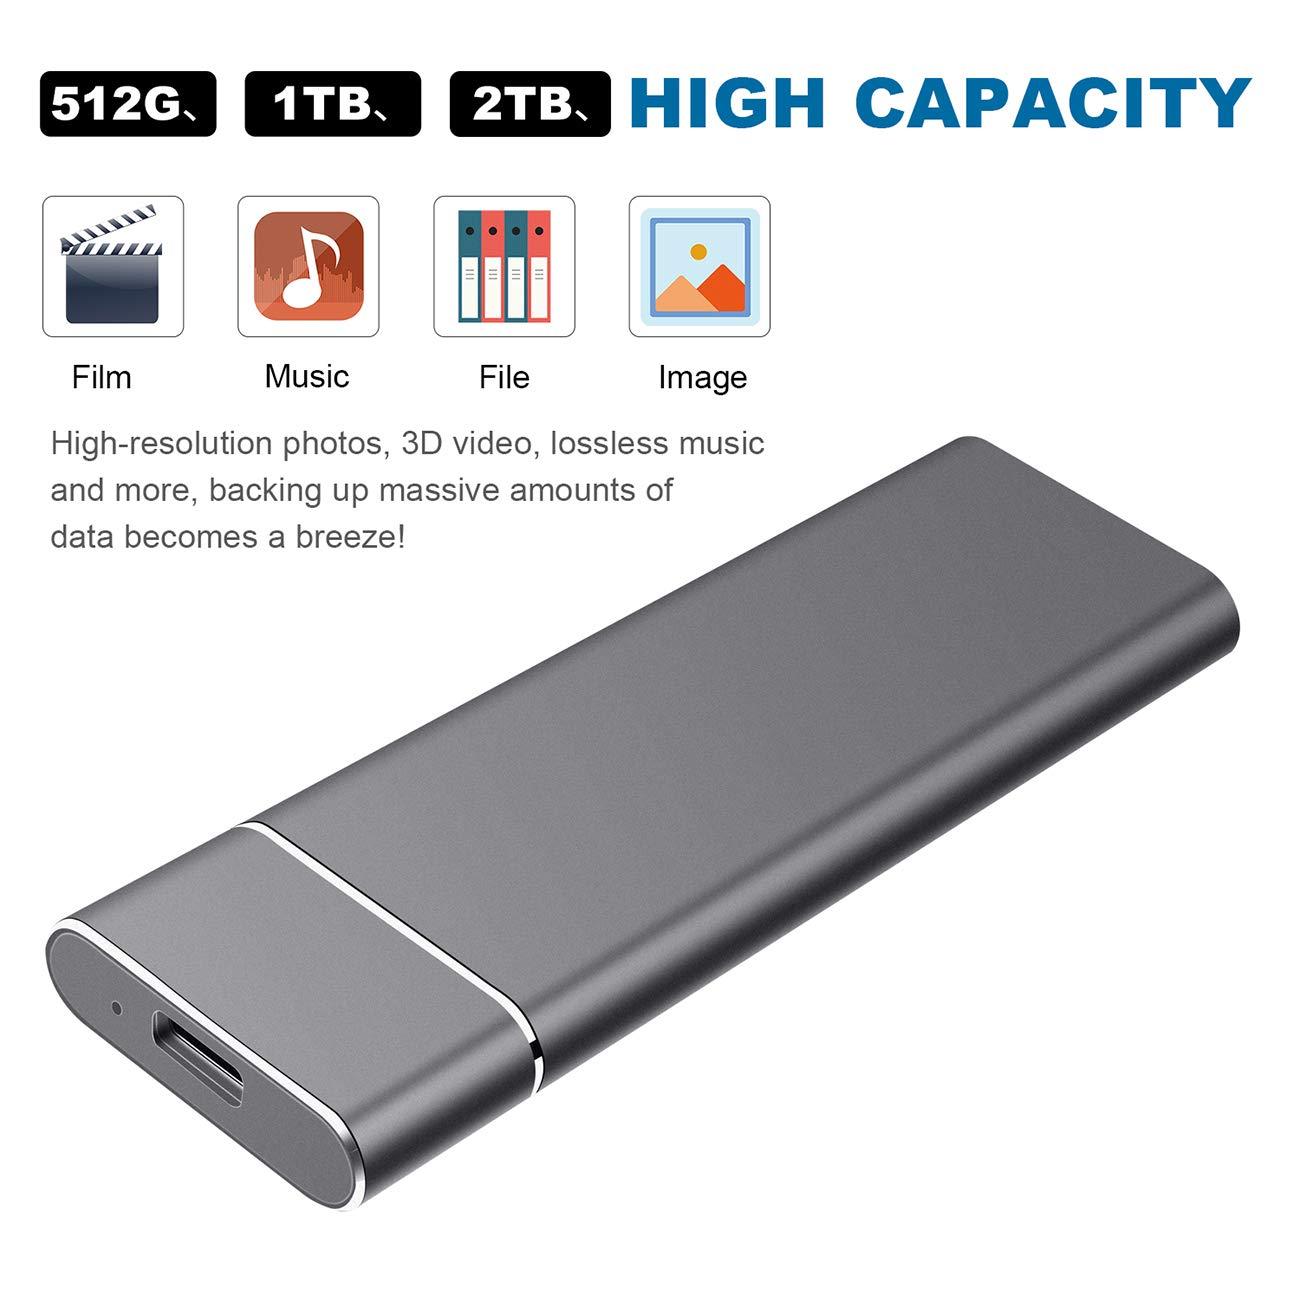 YOOSUN Externe Festplatte 2tb USB 3.1 Externe Festplatte f/ür Mac,PC,PS4,Xbox 2tb, schwarz